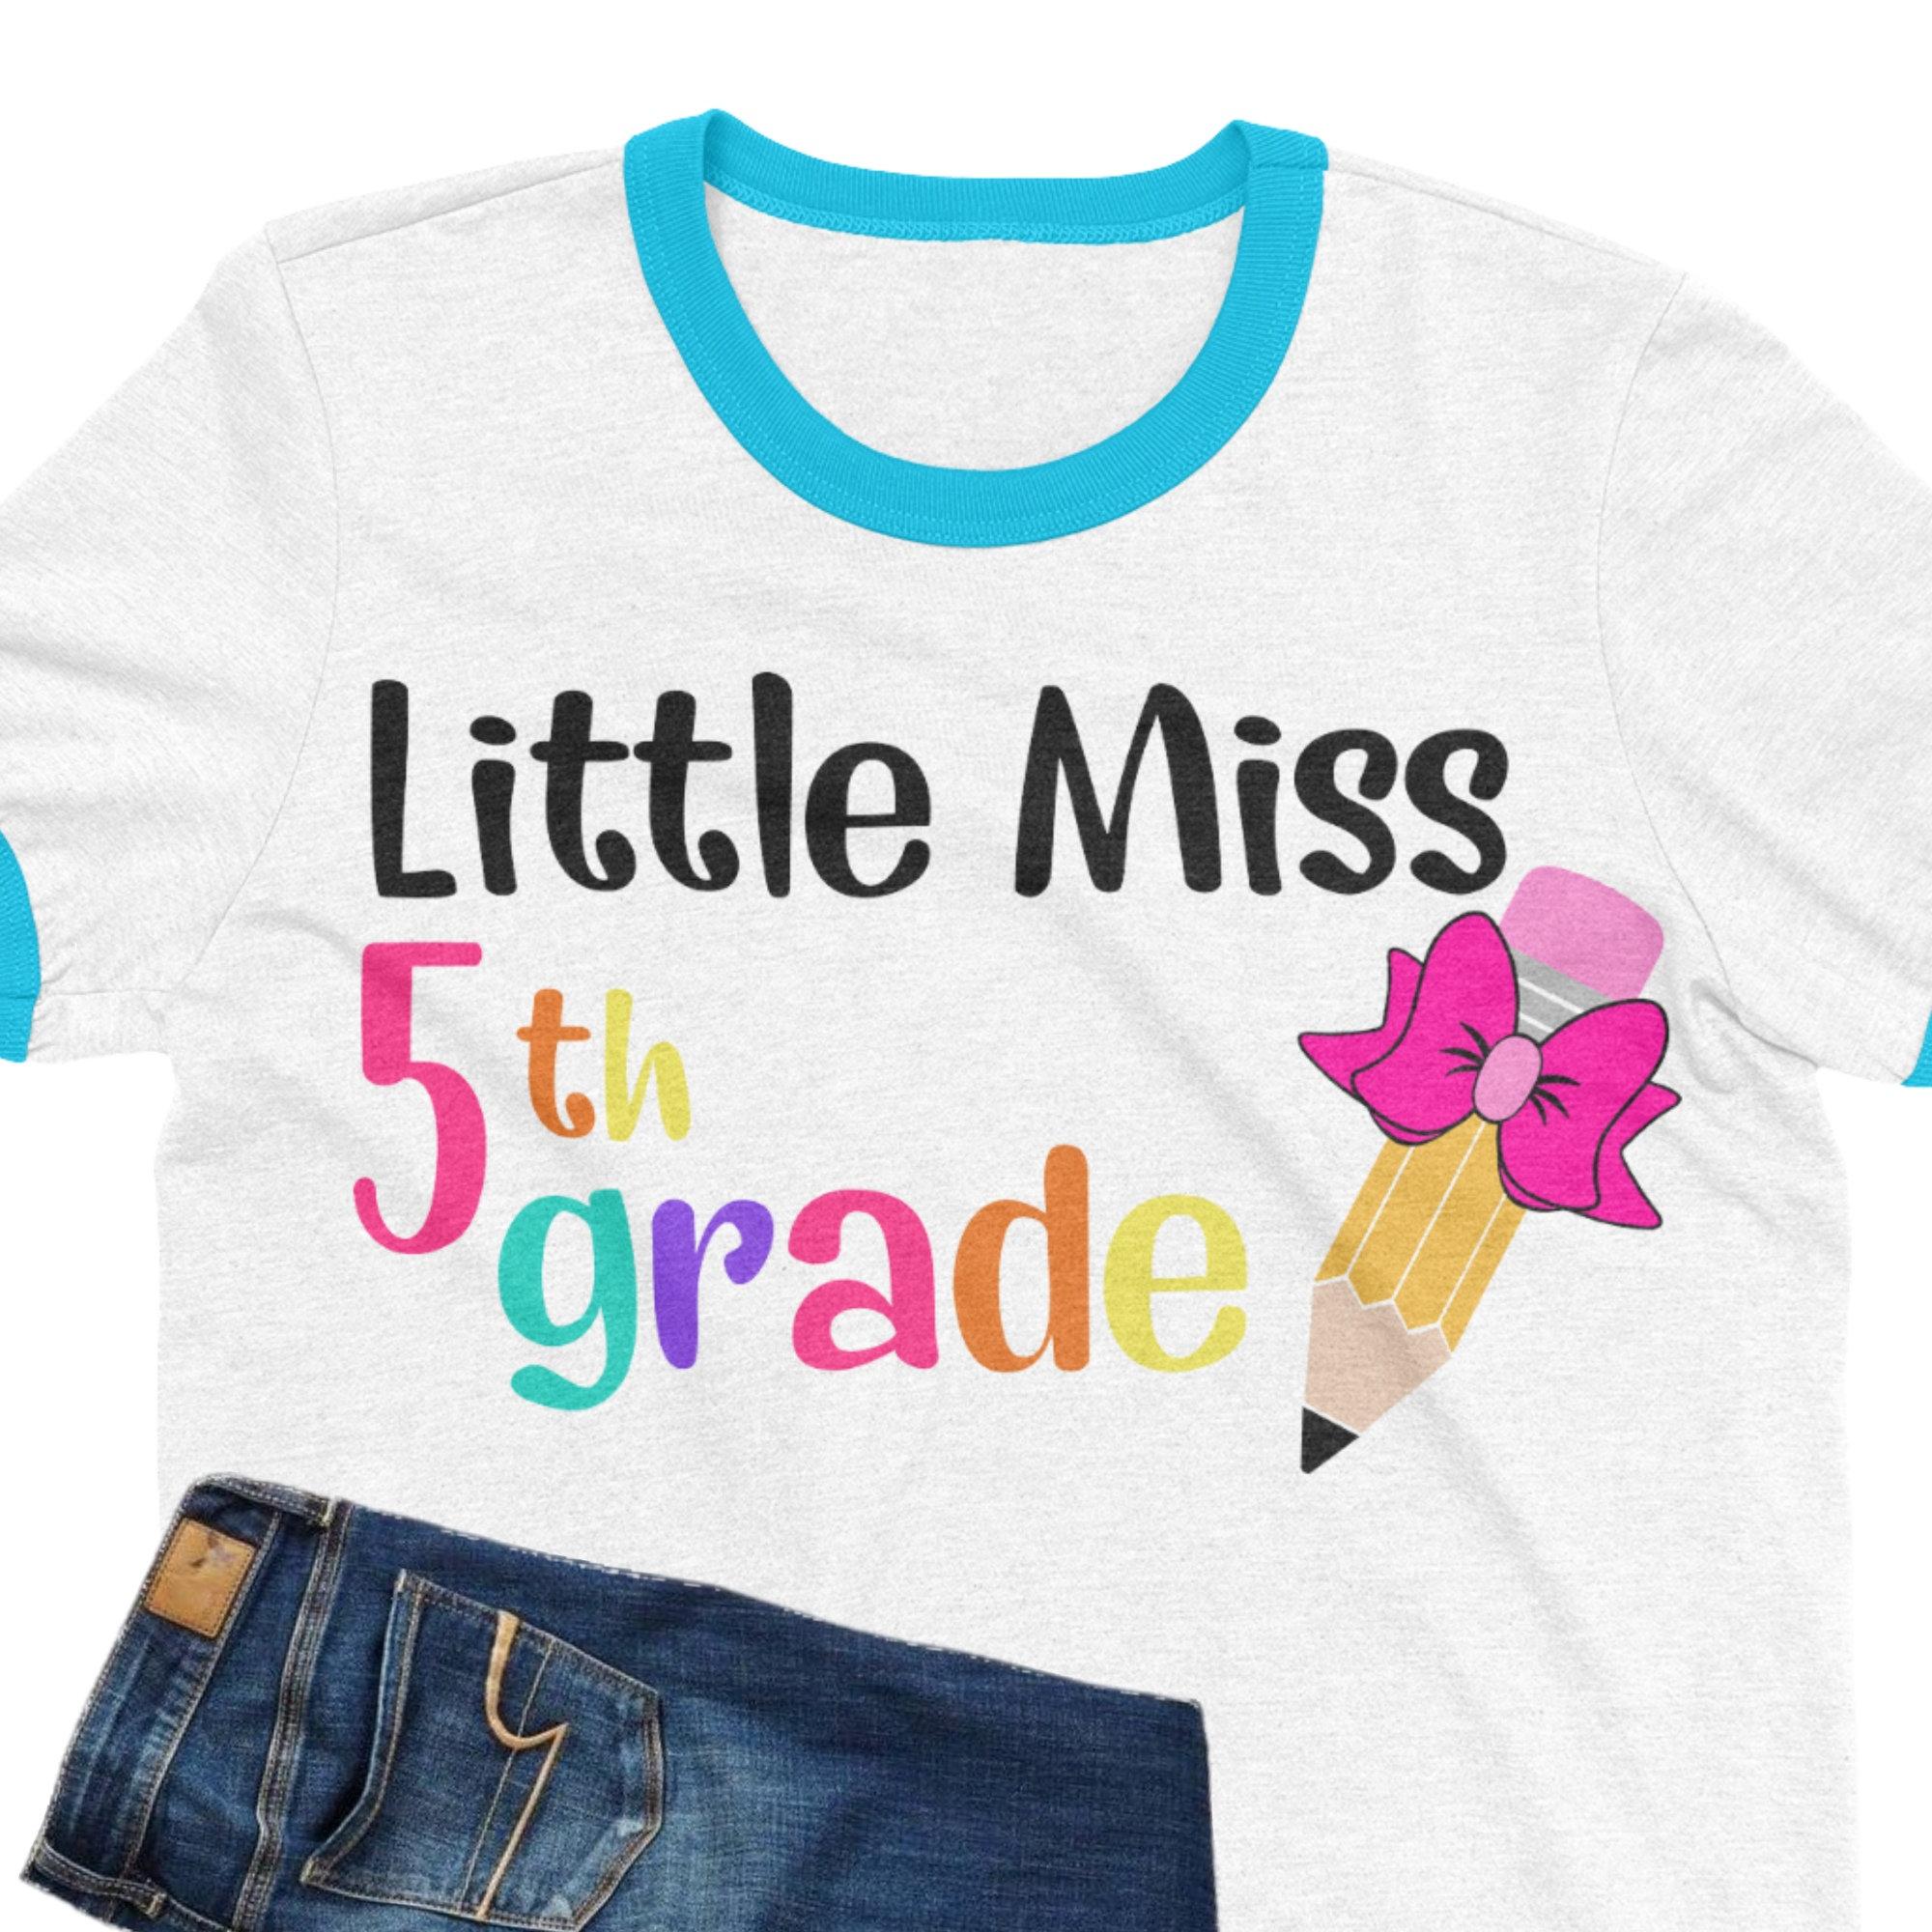 Little-miss-5th-grade-svgpencil-svgschool-svgfifth-grade-svgteacher-svgsvg-for-cricut-bow-svgpencil-bow5th-grade-svgback-to-school-5e21b606